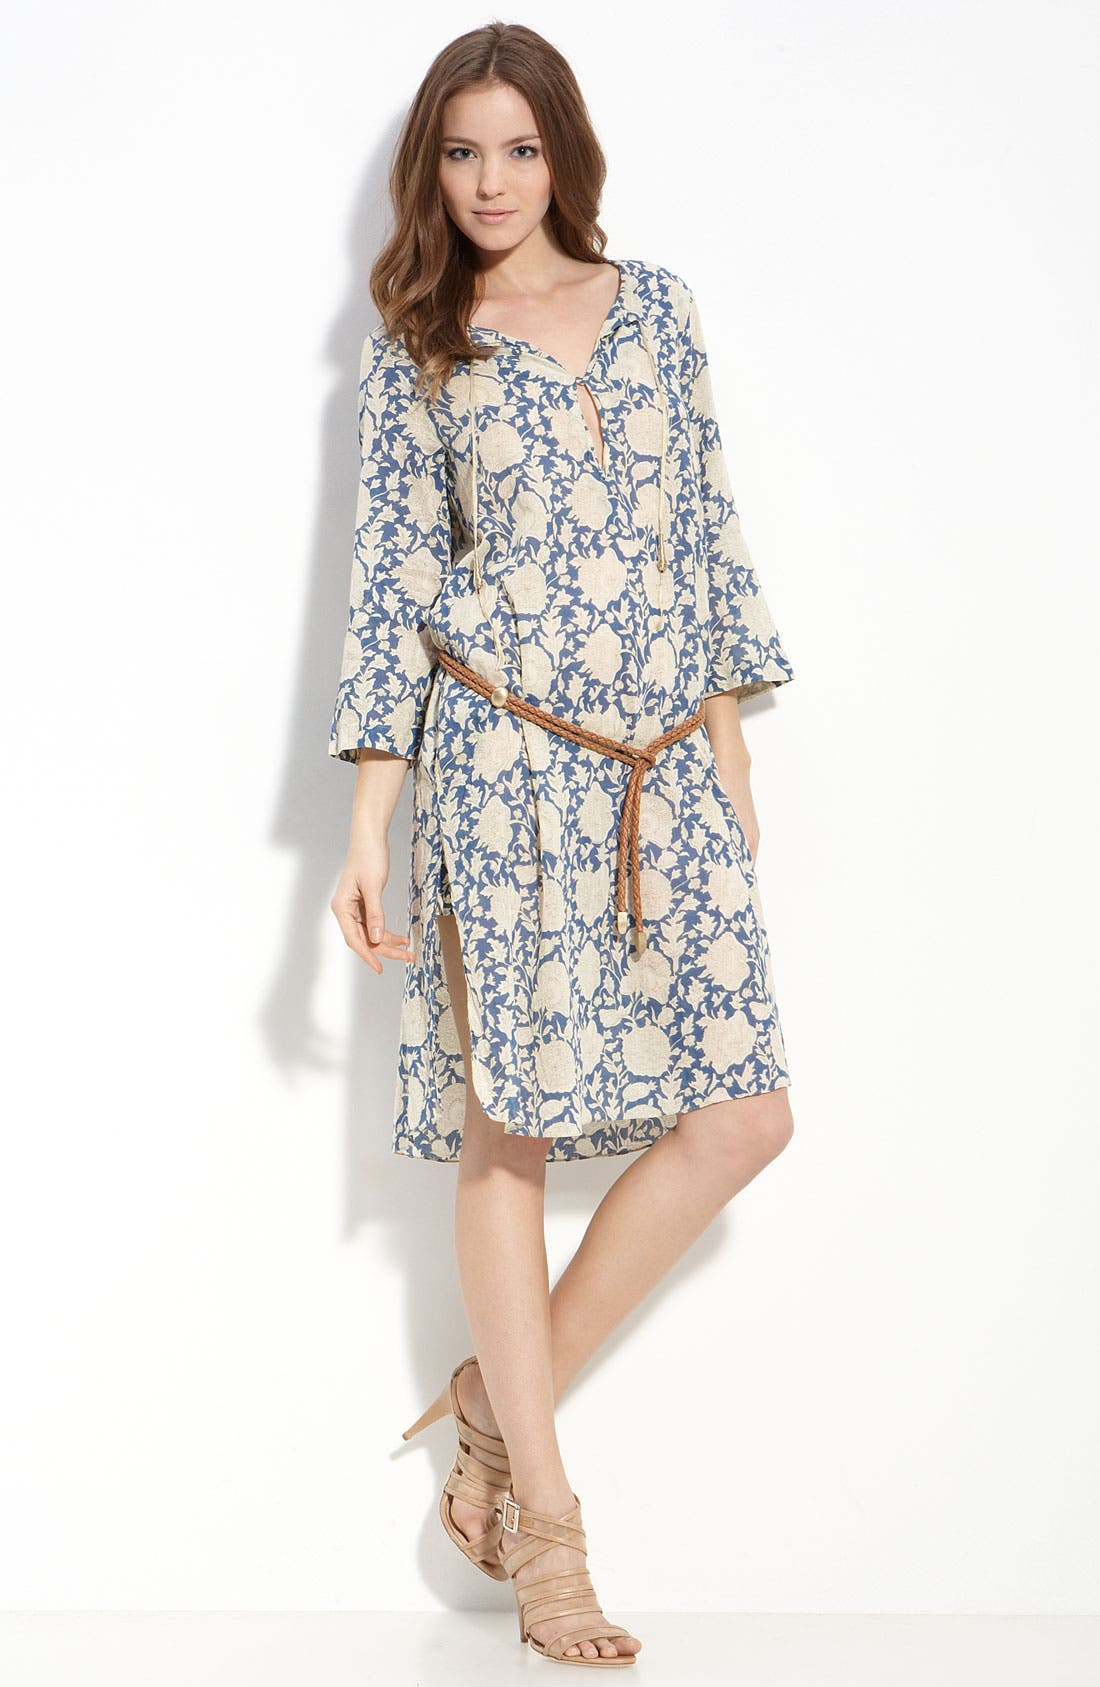 Main Image - Laurence Dolige 'Goa' Print Dress